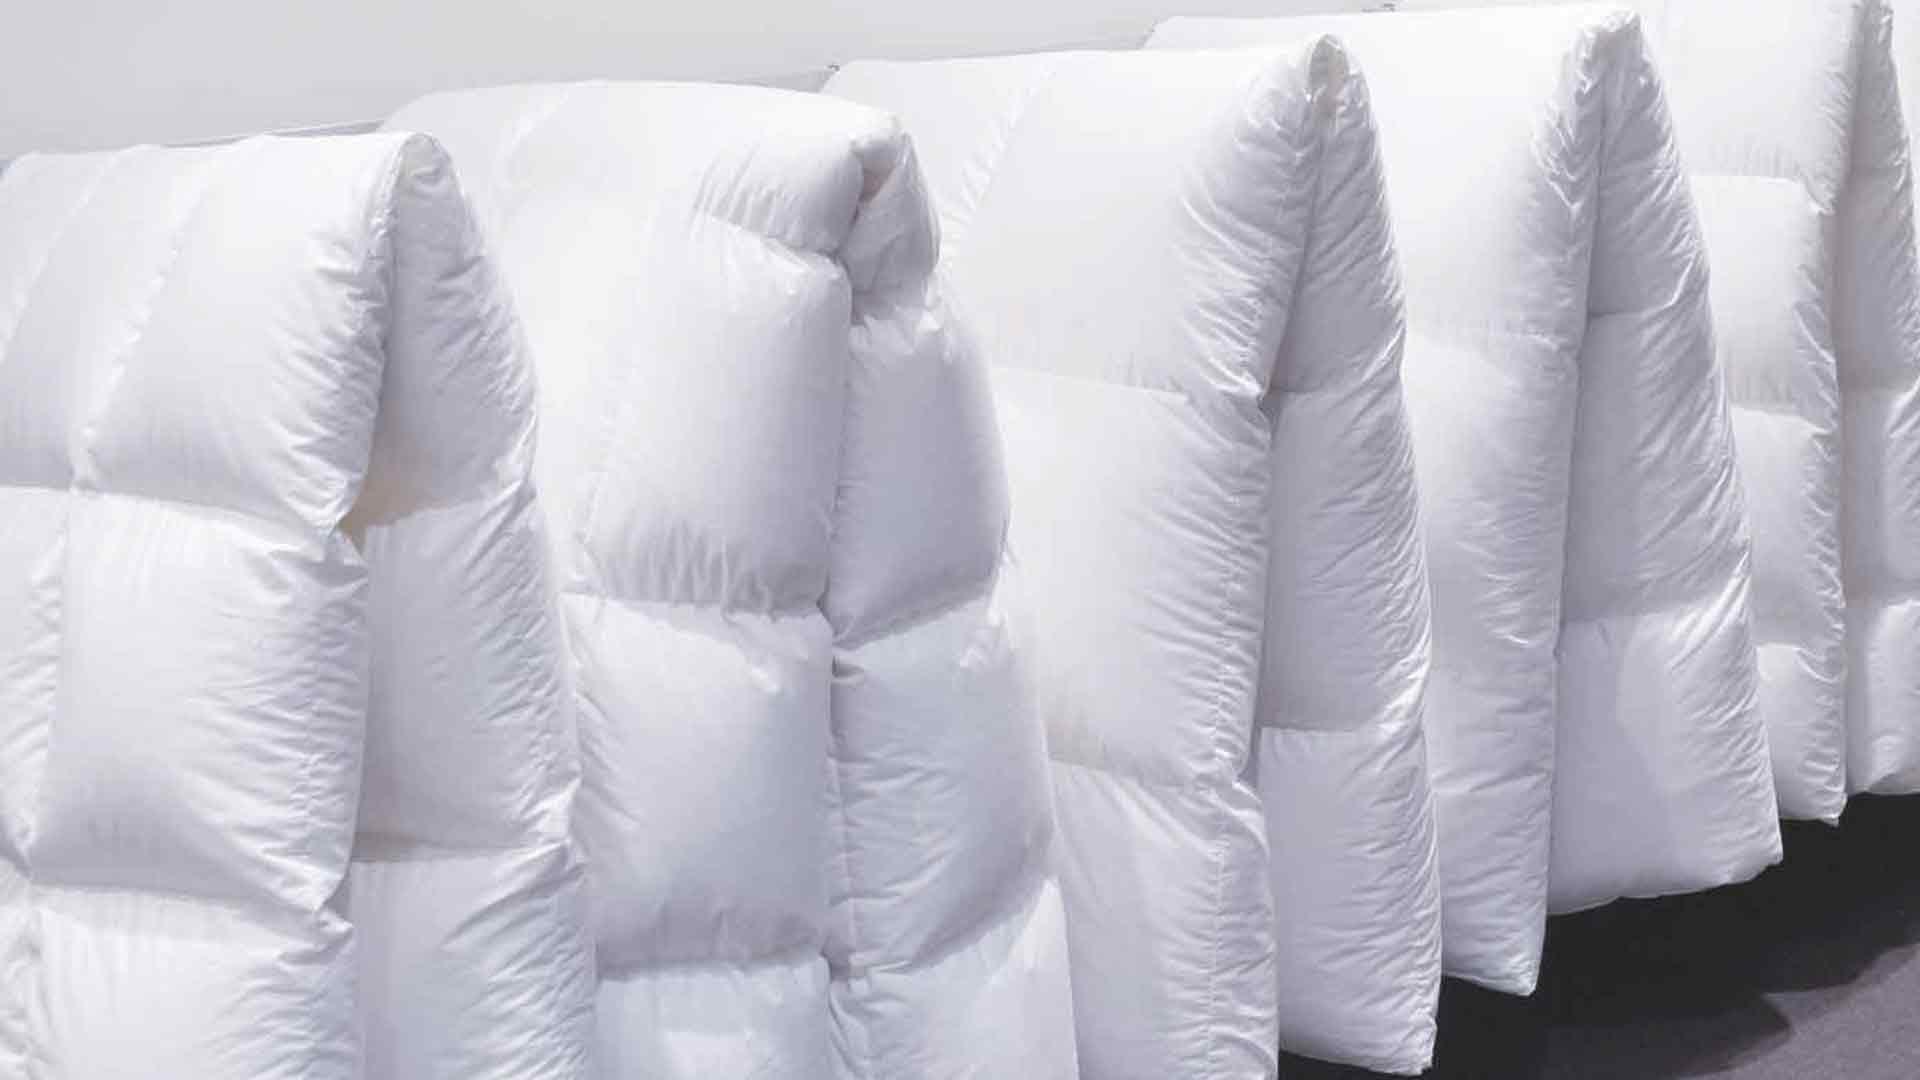 betten hoenscheidt duesseldorf zudecken daunendecken betten h nscheidt. Black Bedroom Furniture Sets. Home Design Ideas